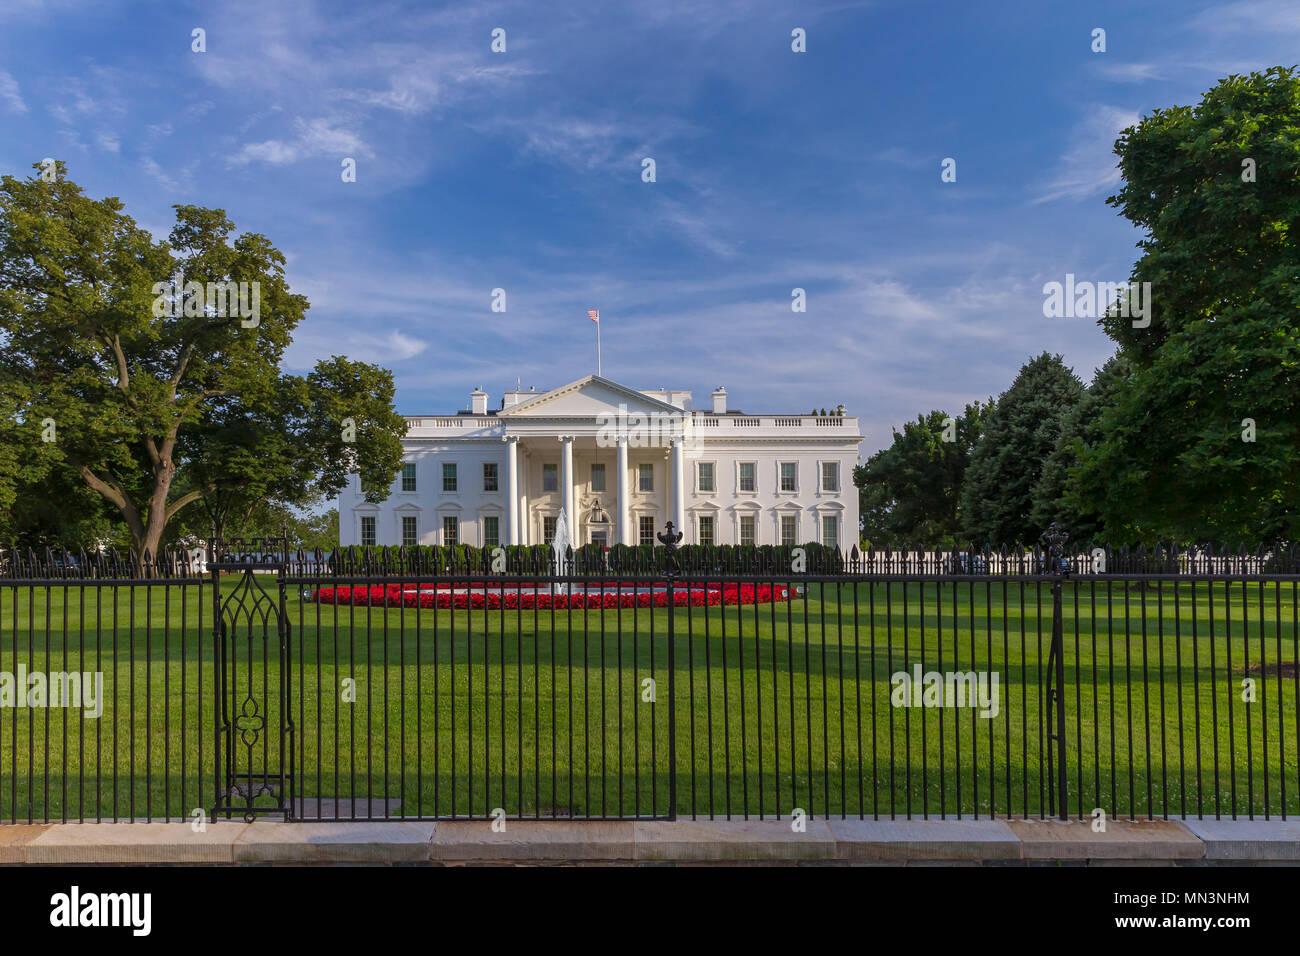 Summer evening, South Facade, White House, Washington DC, USA, North America - Stock Image